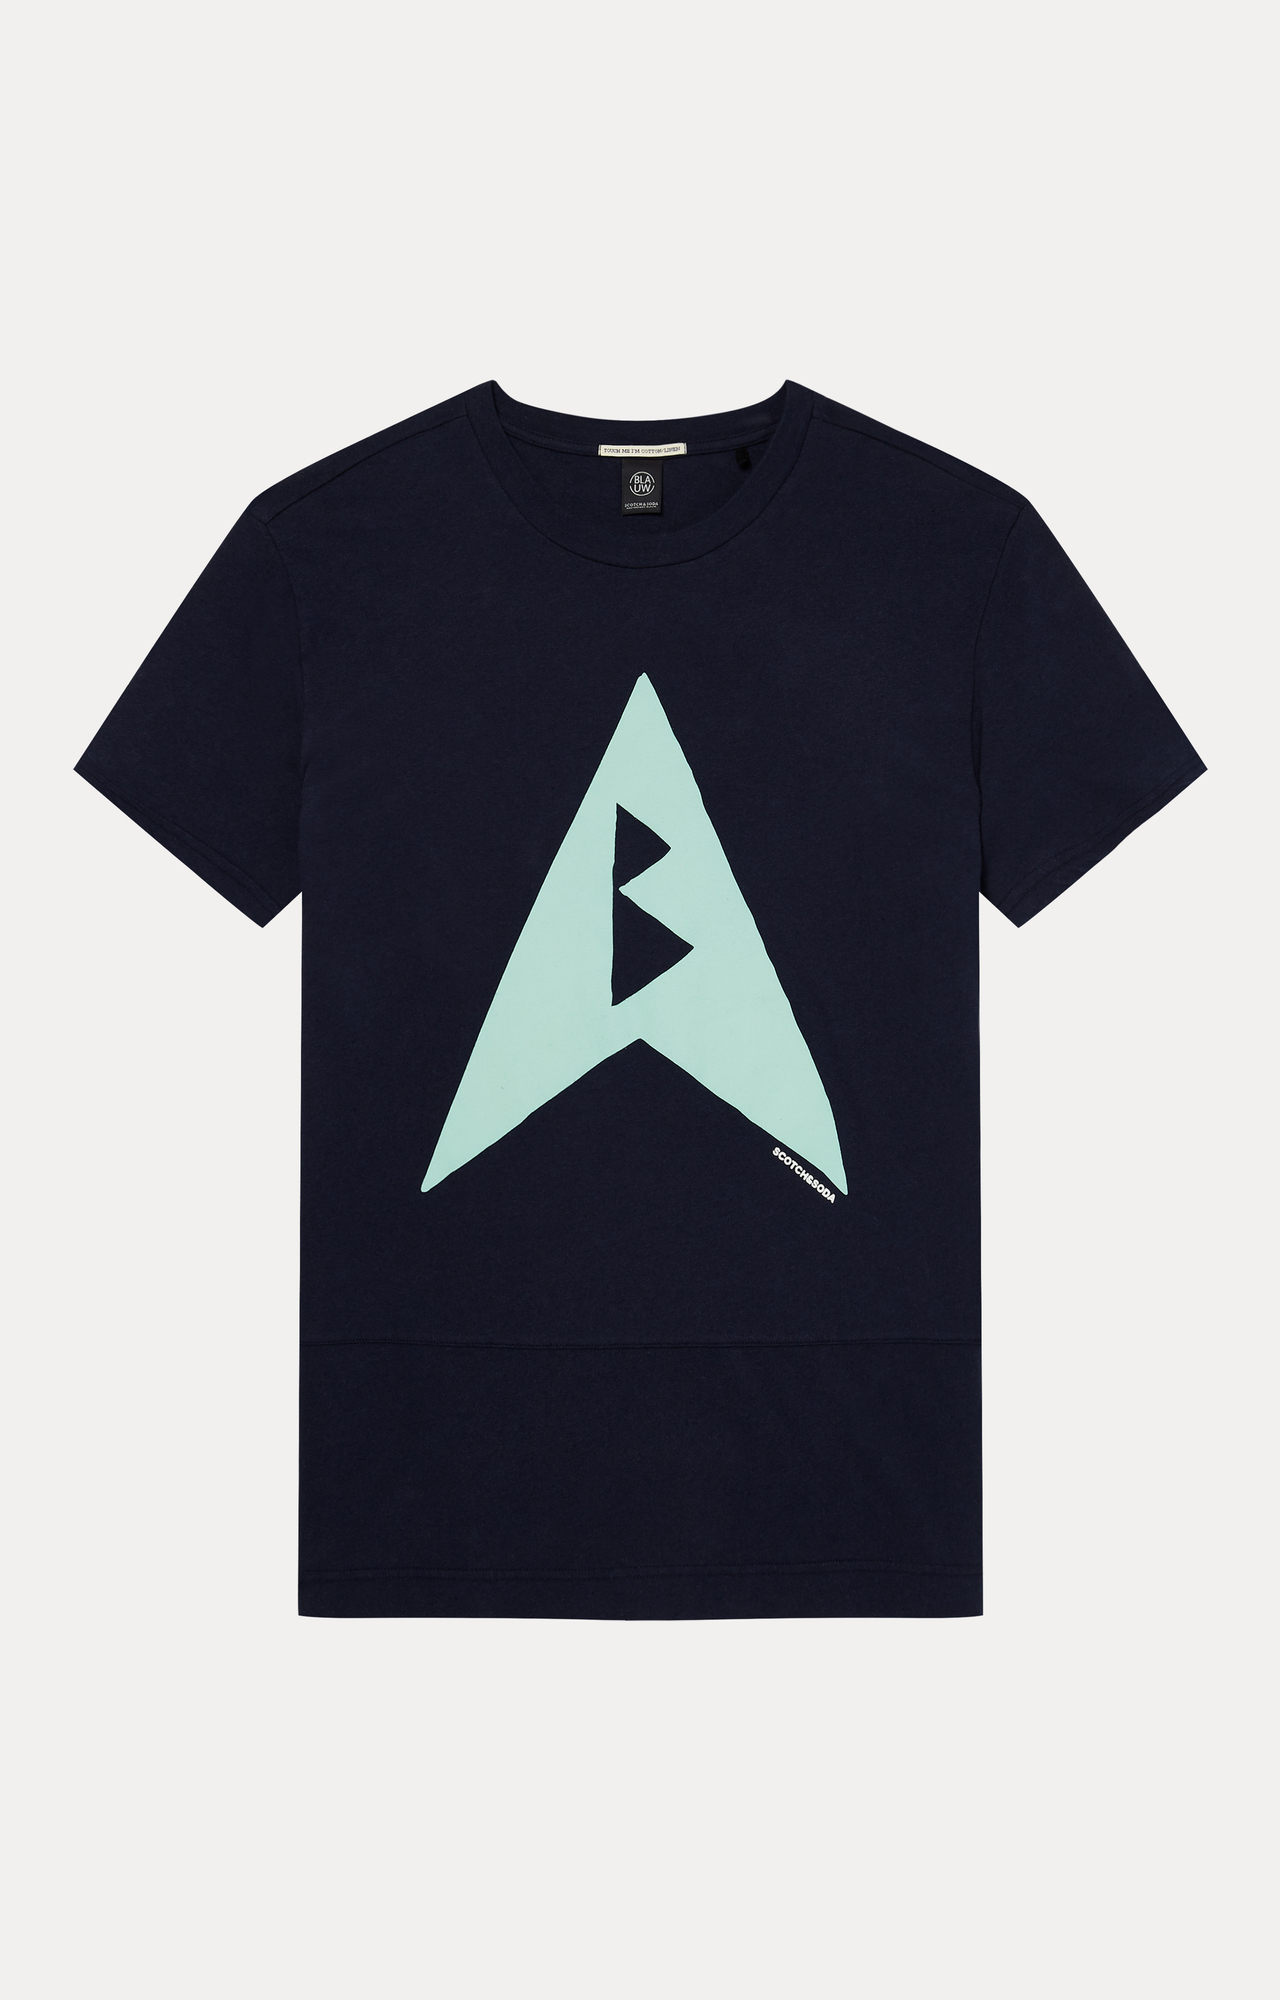 Scotch & Soda   Navy Printed T-Shirt